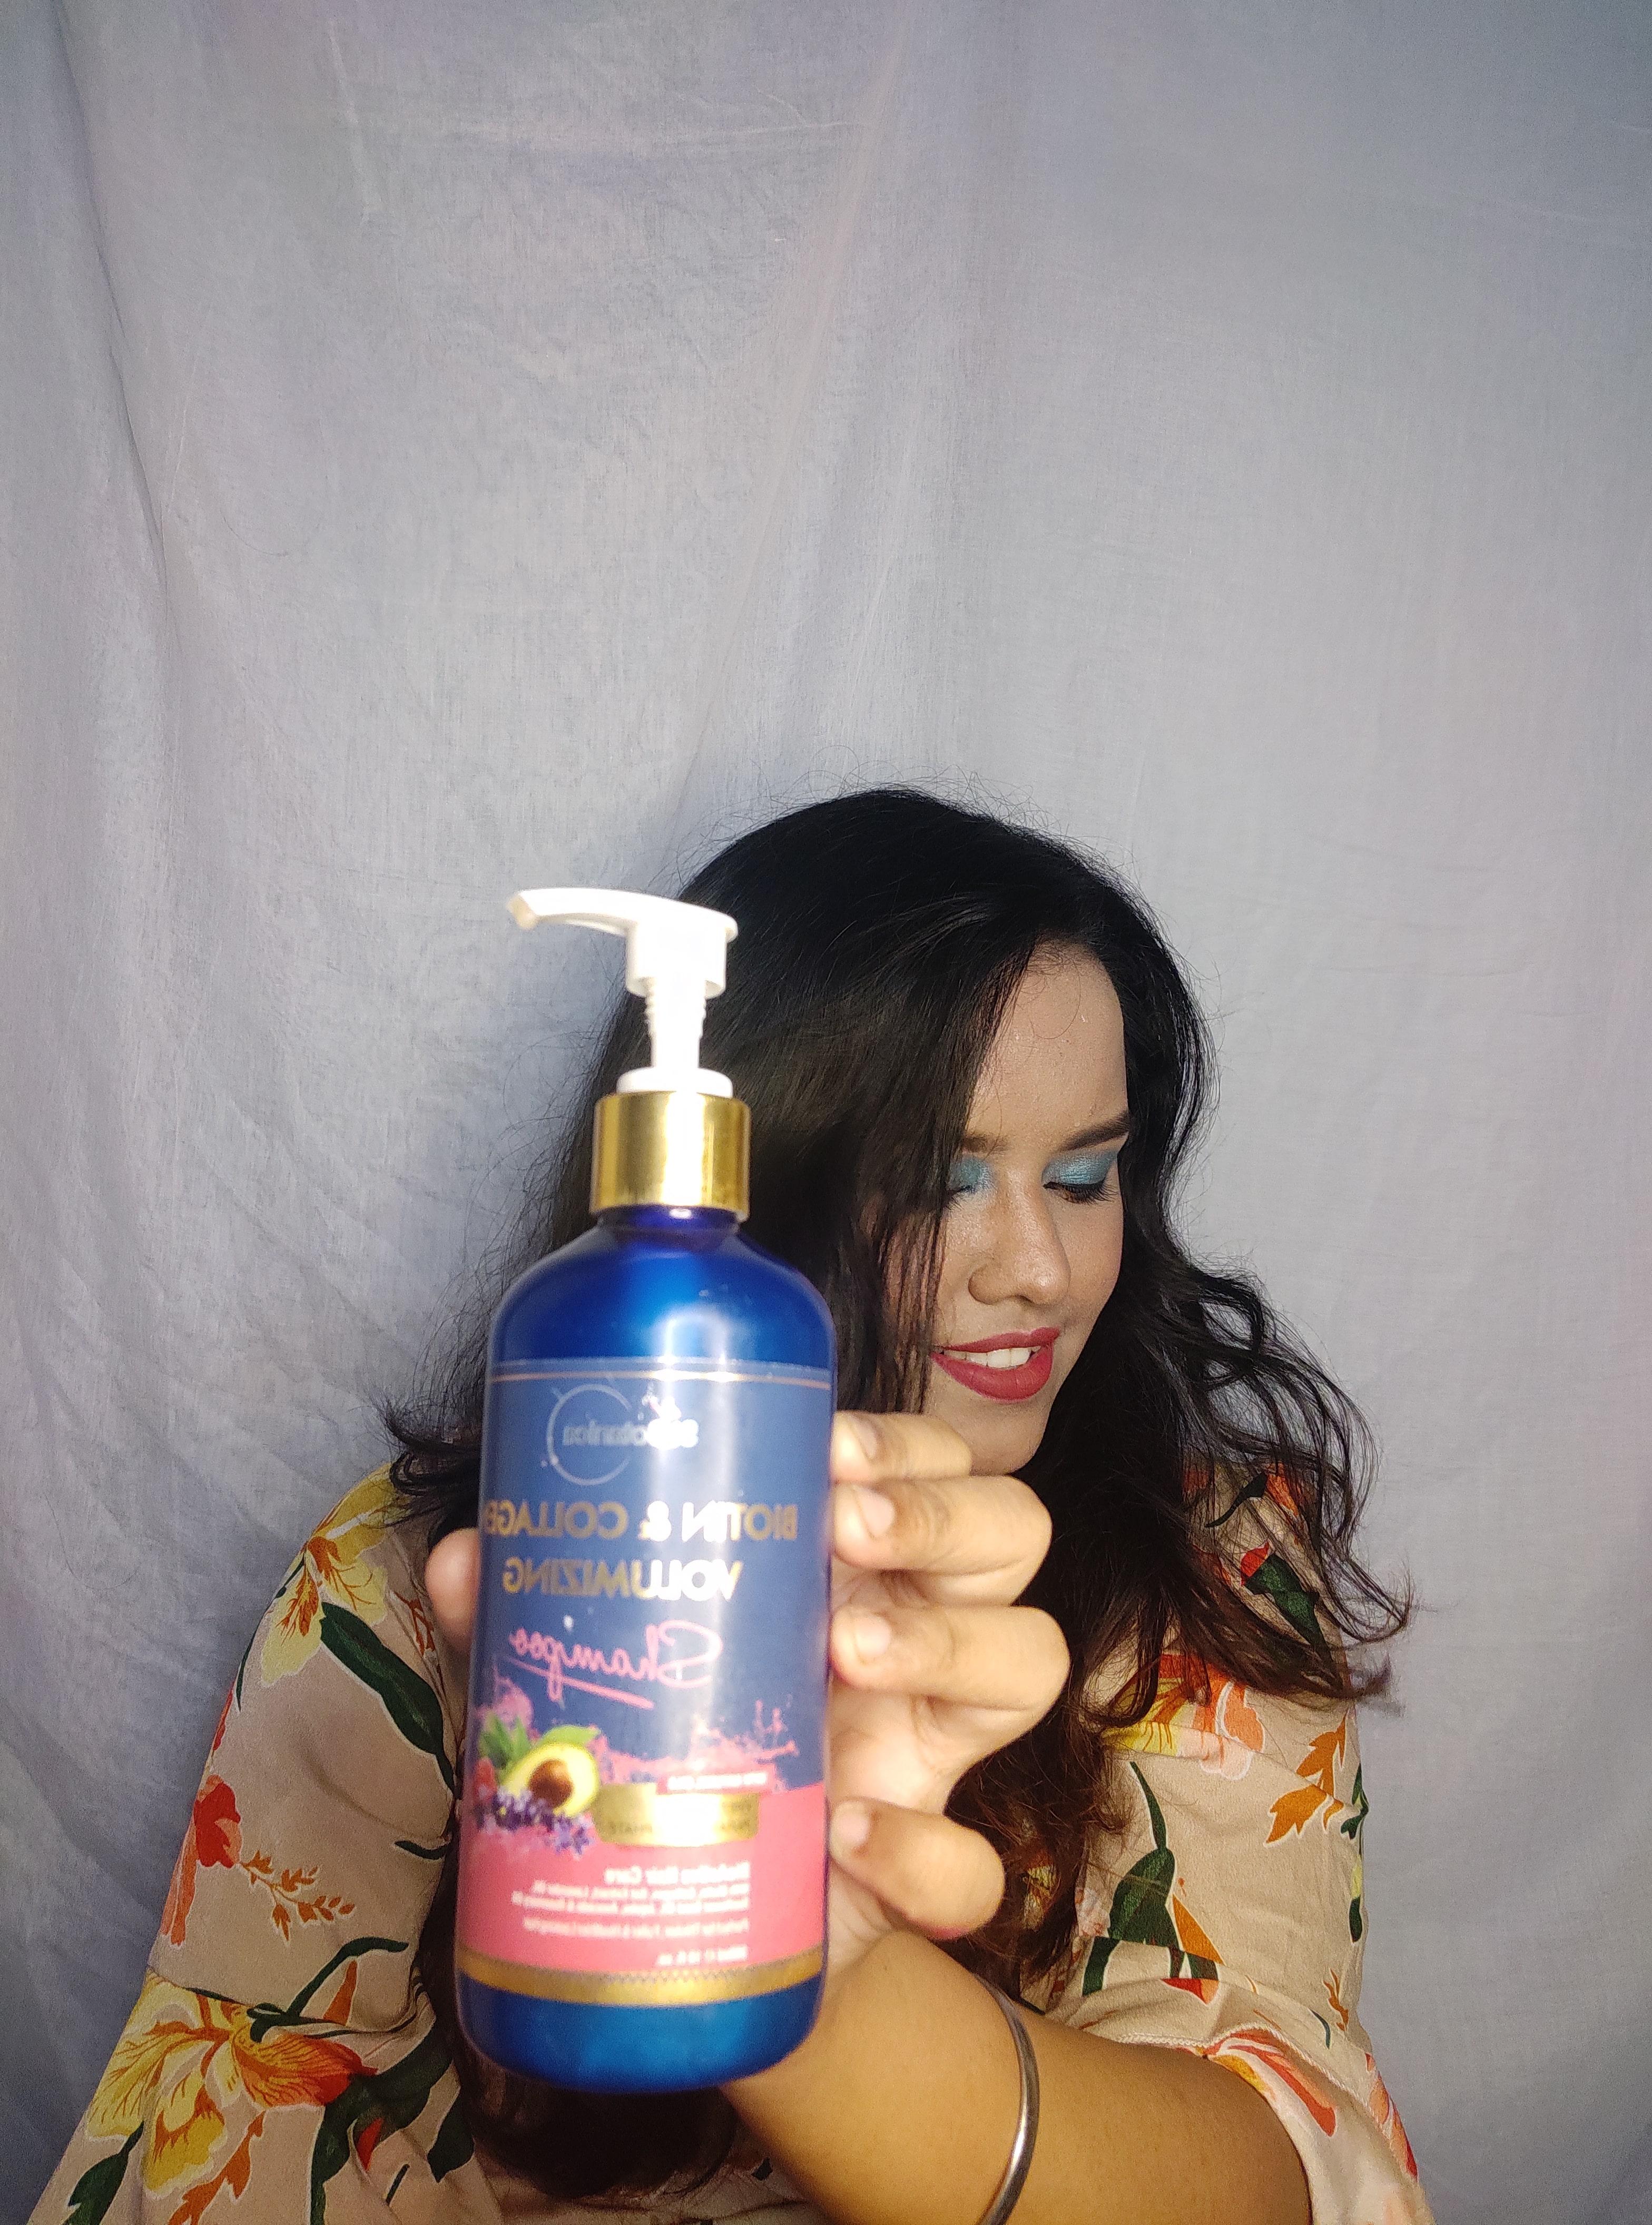 St.Botanica Biotin & Collagen Volumizing Hair Shampoo-For good volumizing hair-By imankitabiswas-1